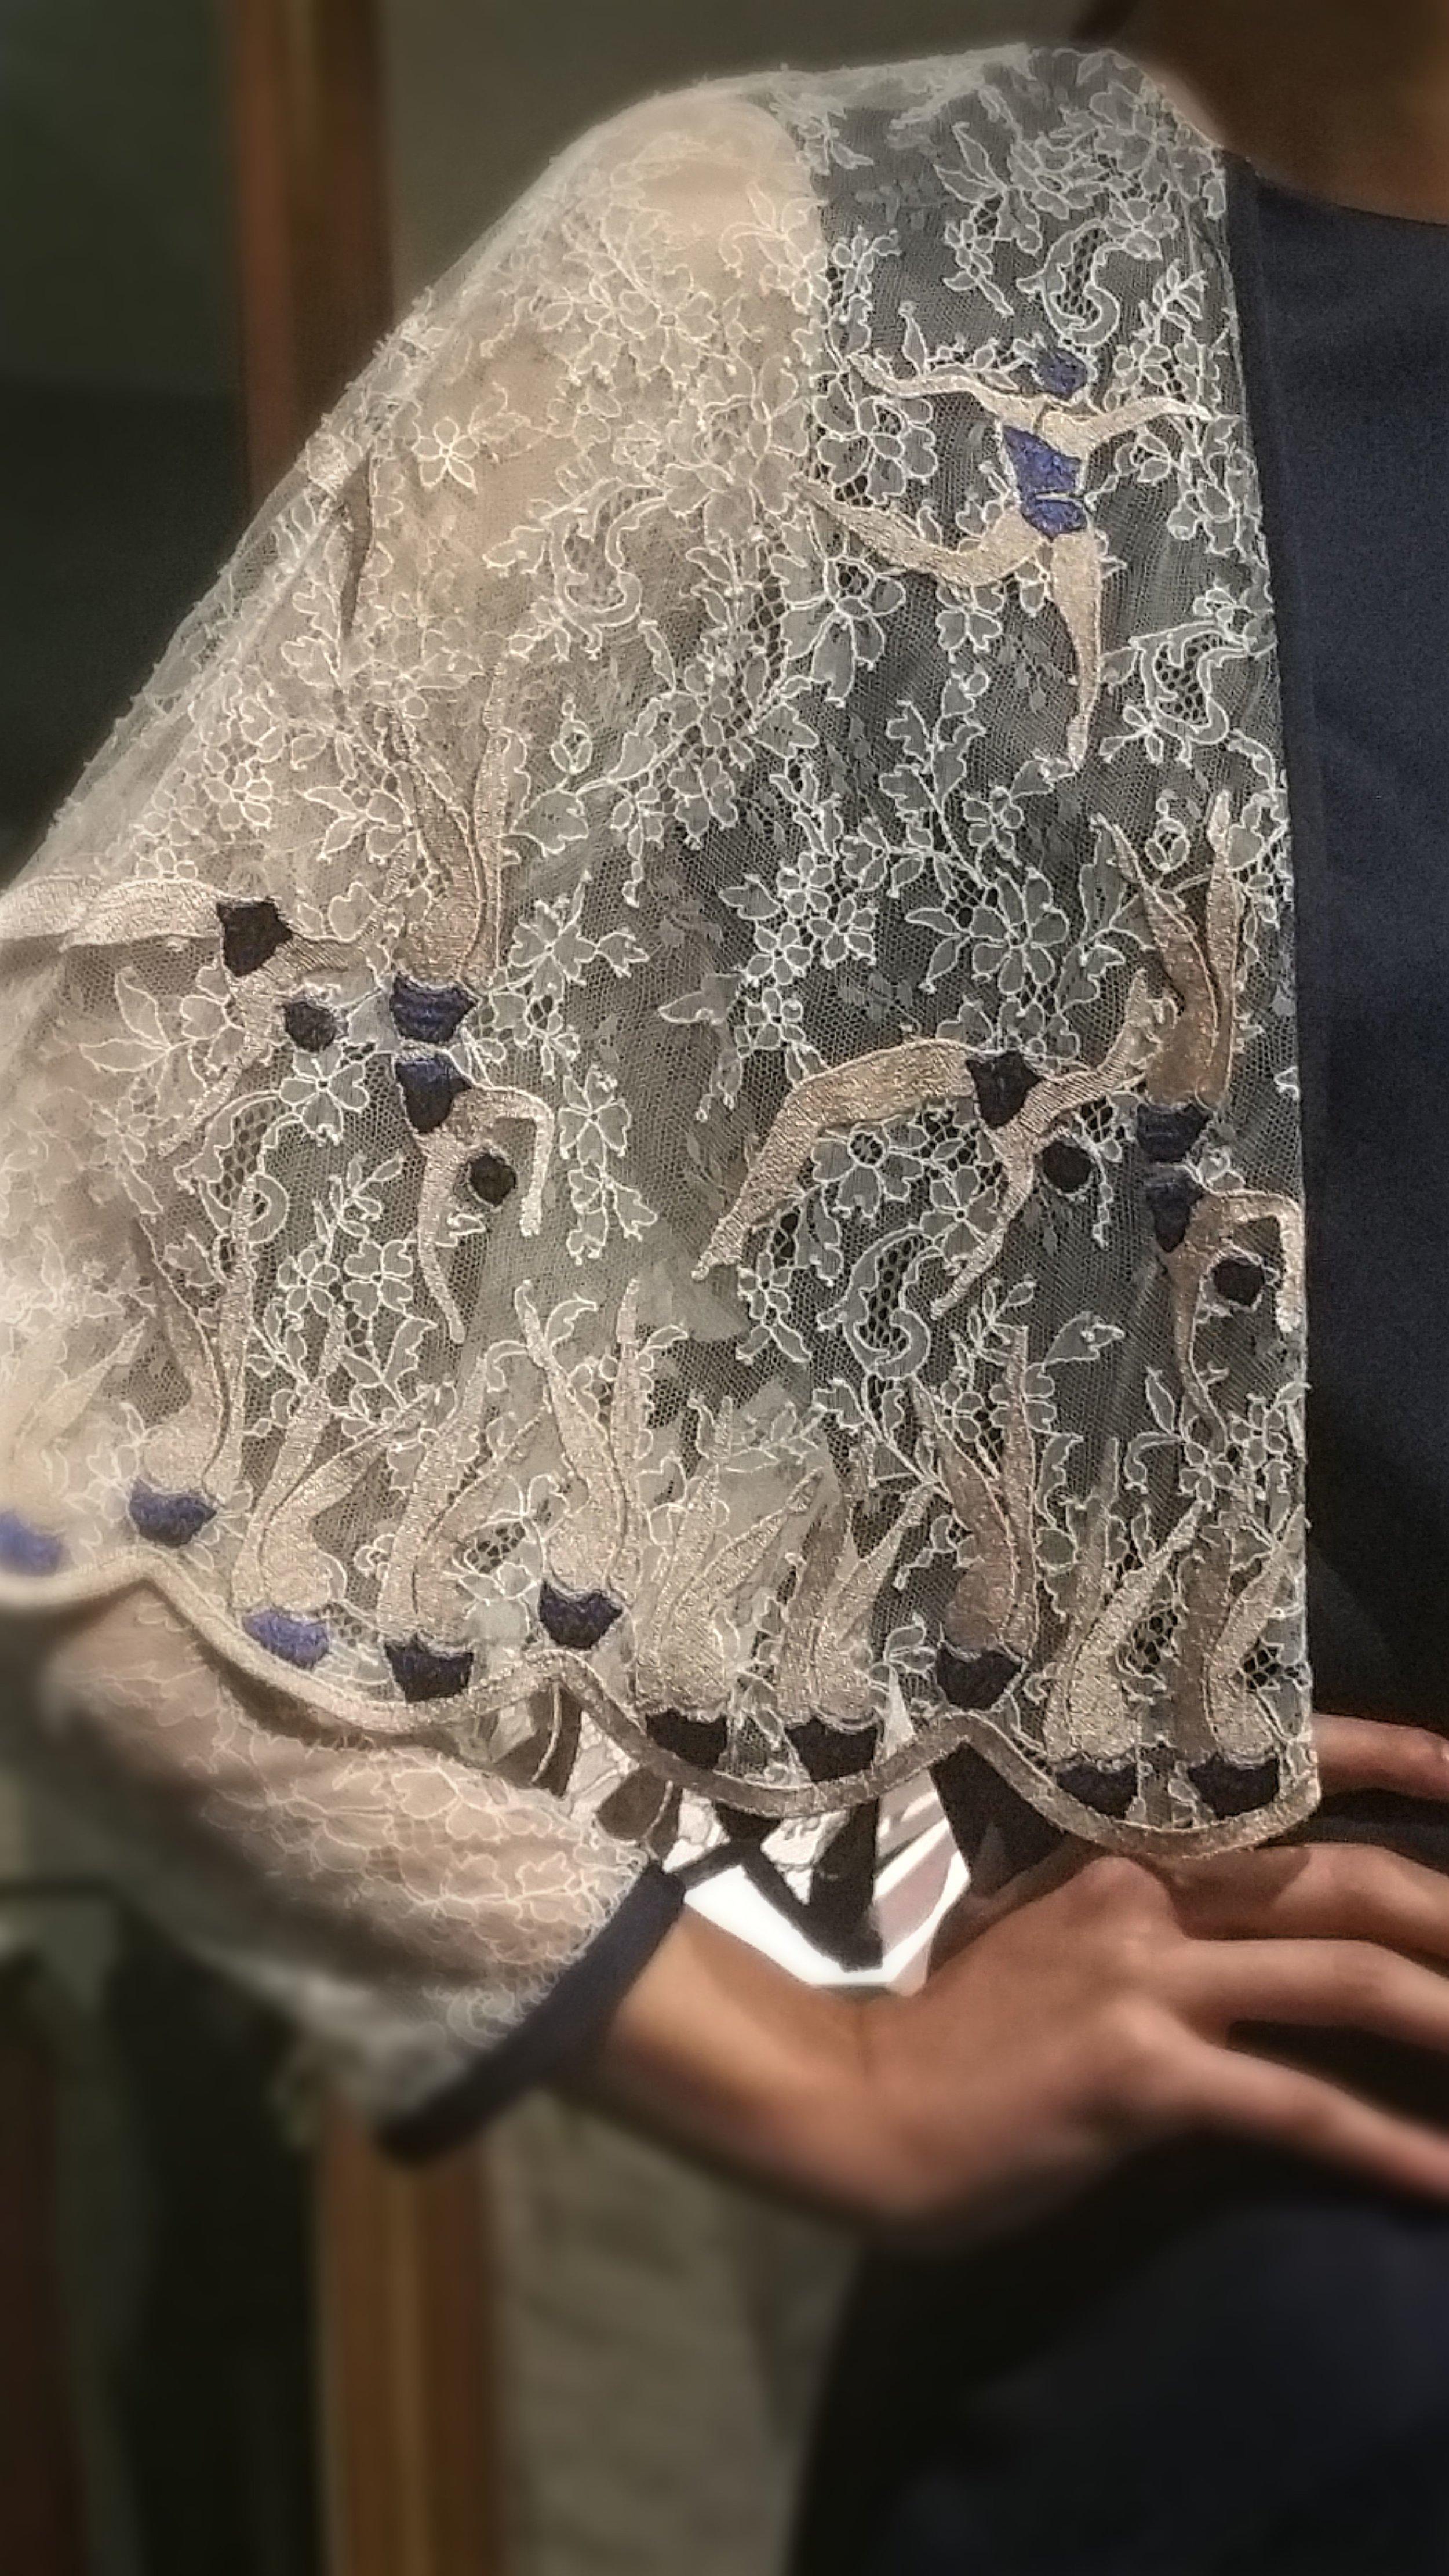 Ong Shunmugam on Couturenotebook